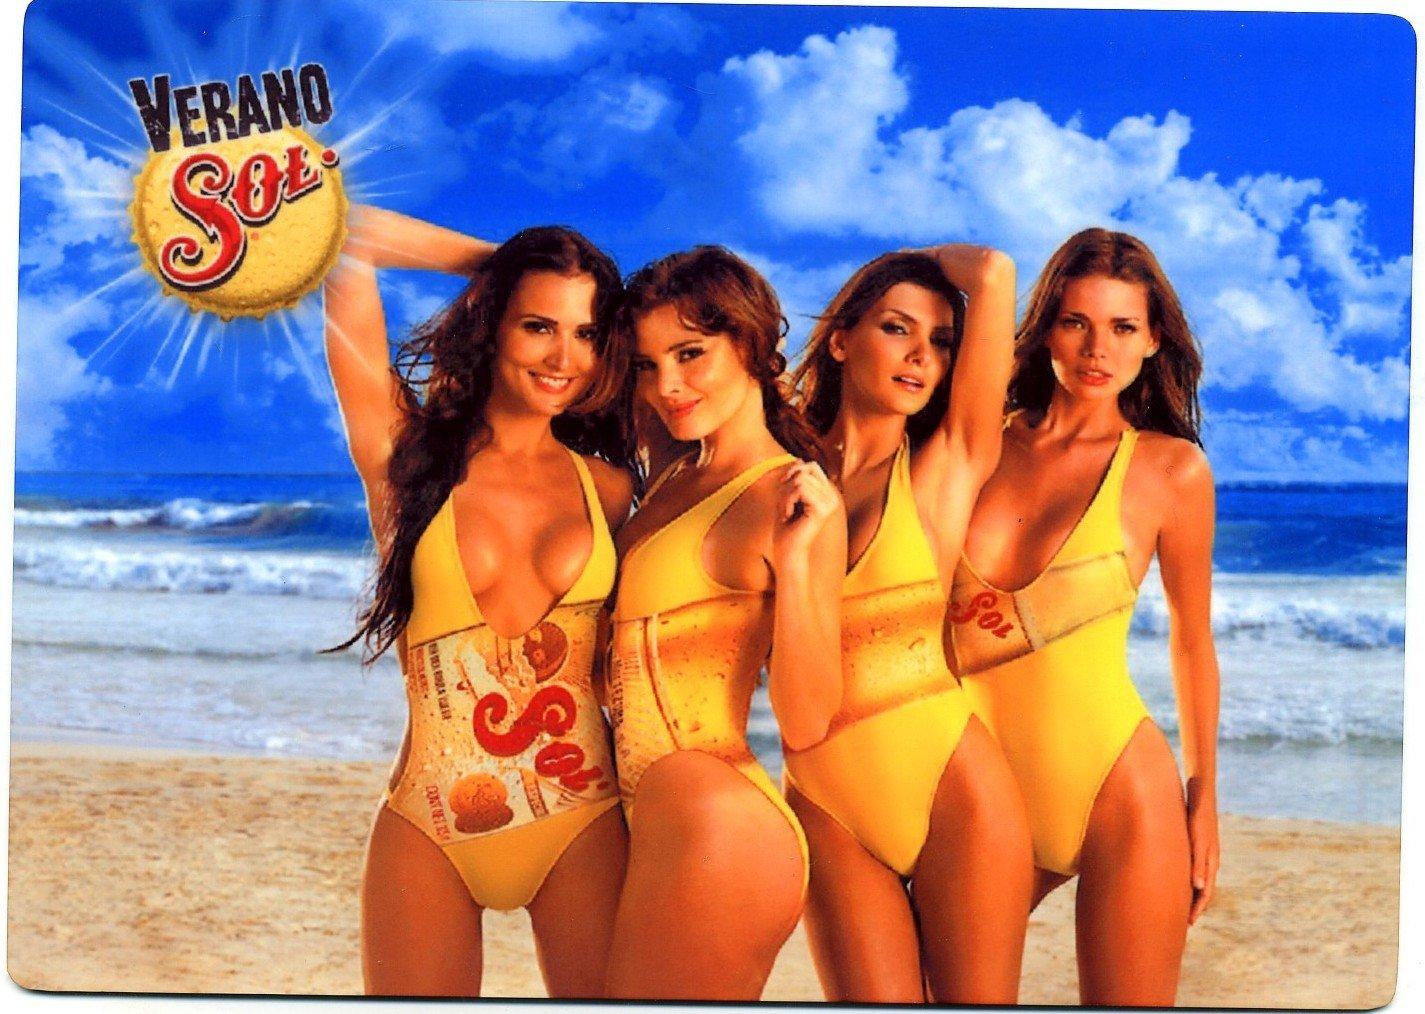 Verano Sol Cerveza - Sexy Beach Girls Beer Sign - Mexico